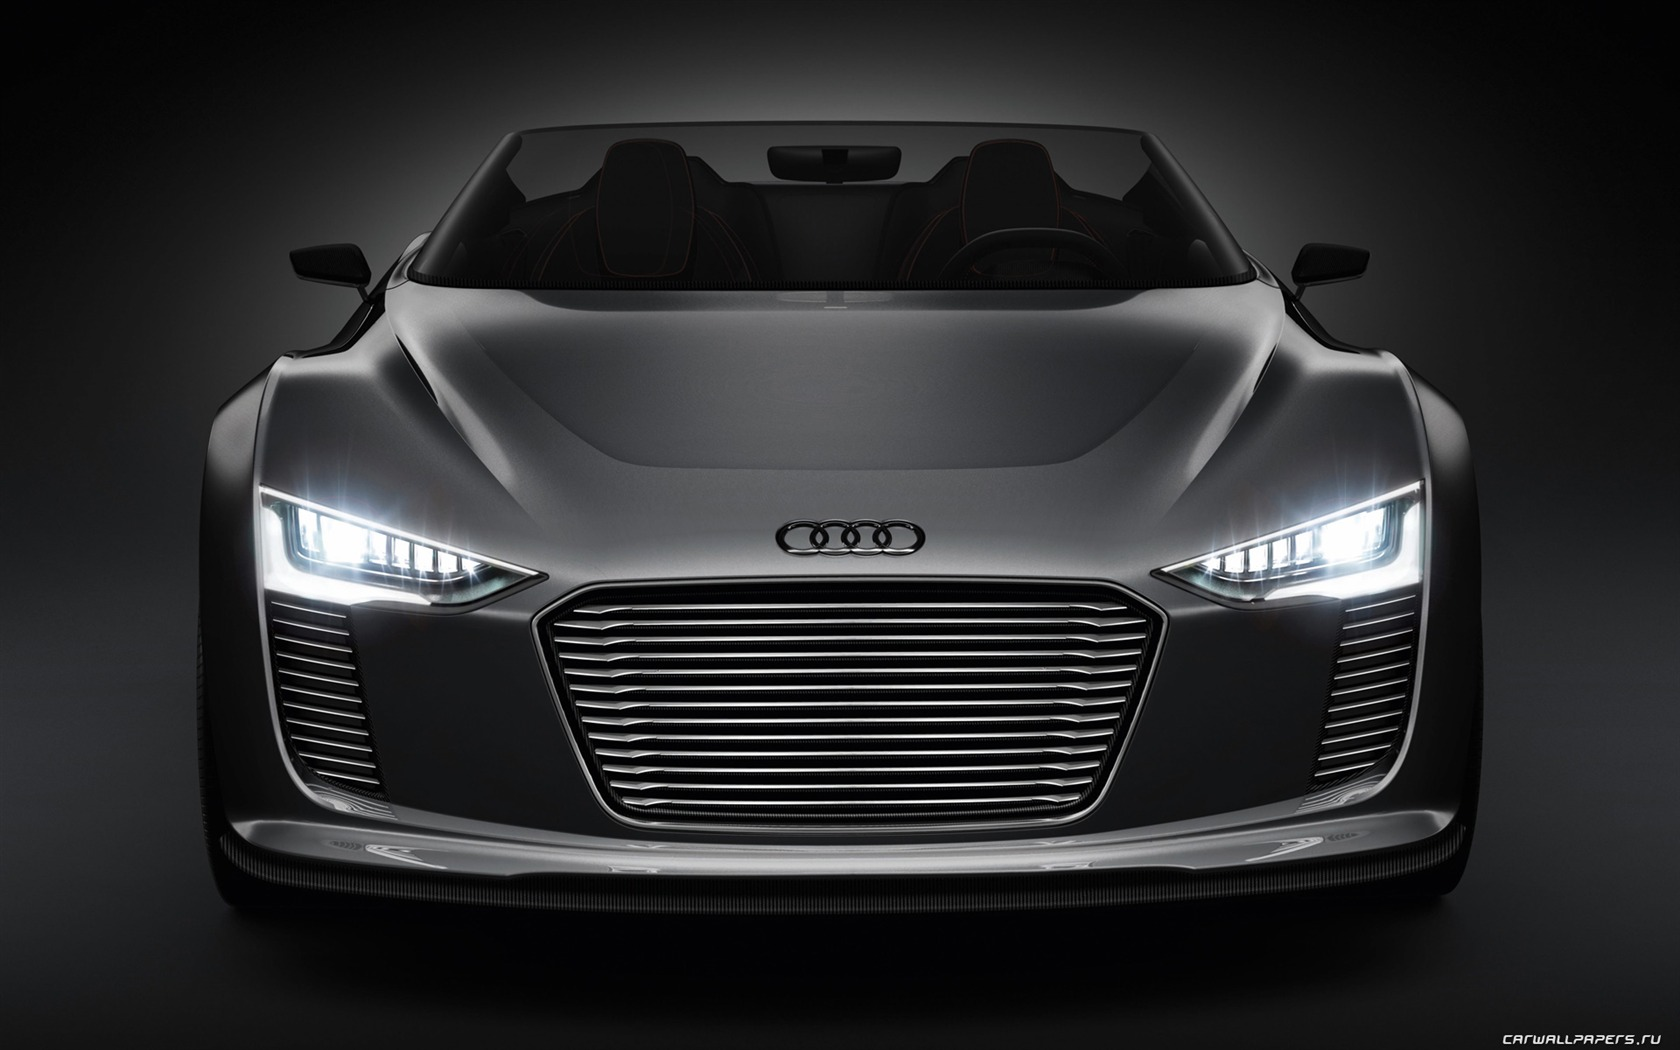 Concept Car Audi E Tron Spyder 2010 Hd Wallpaper 9